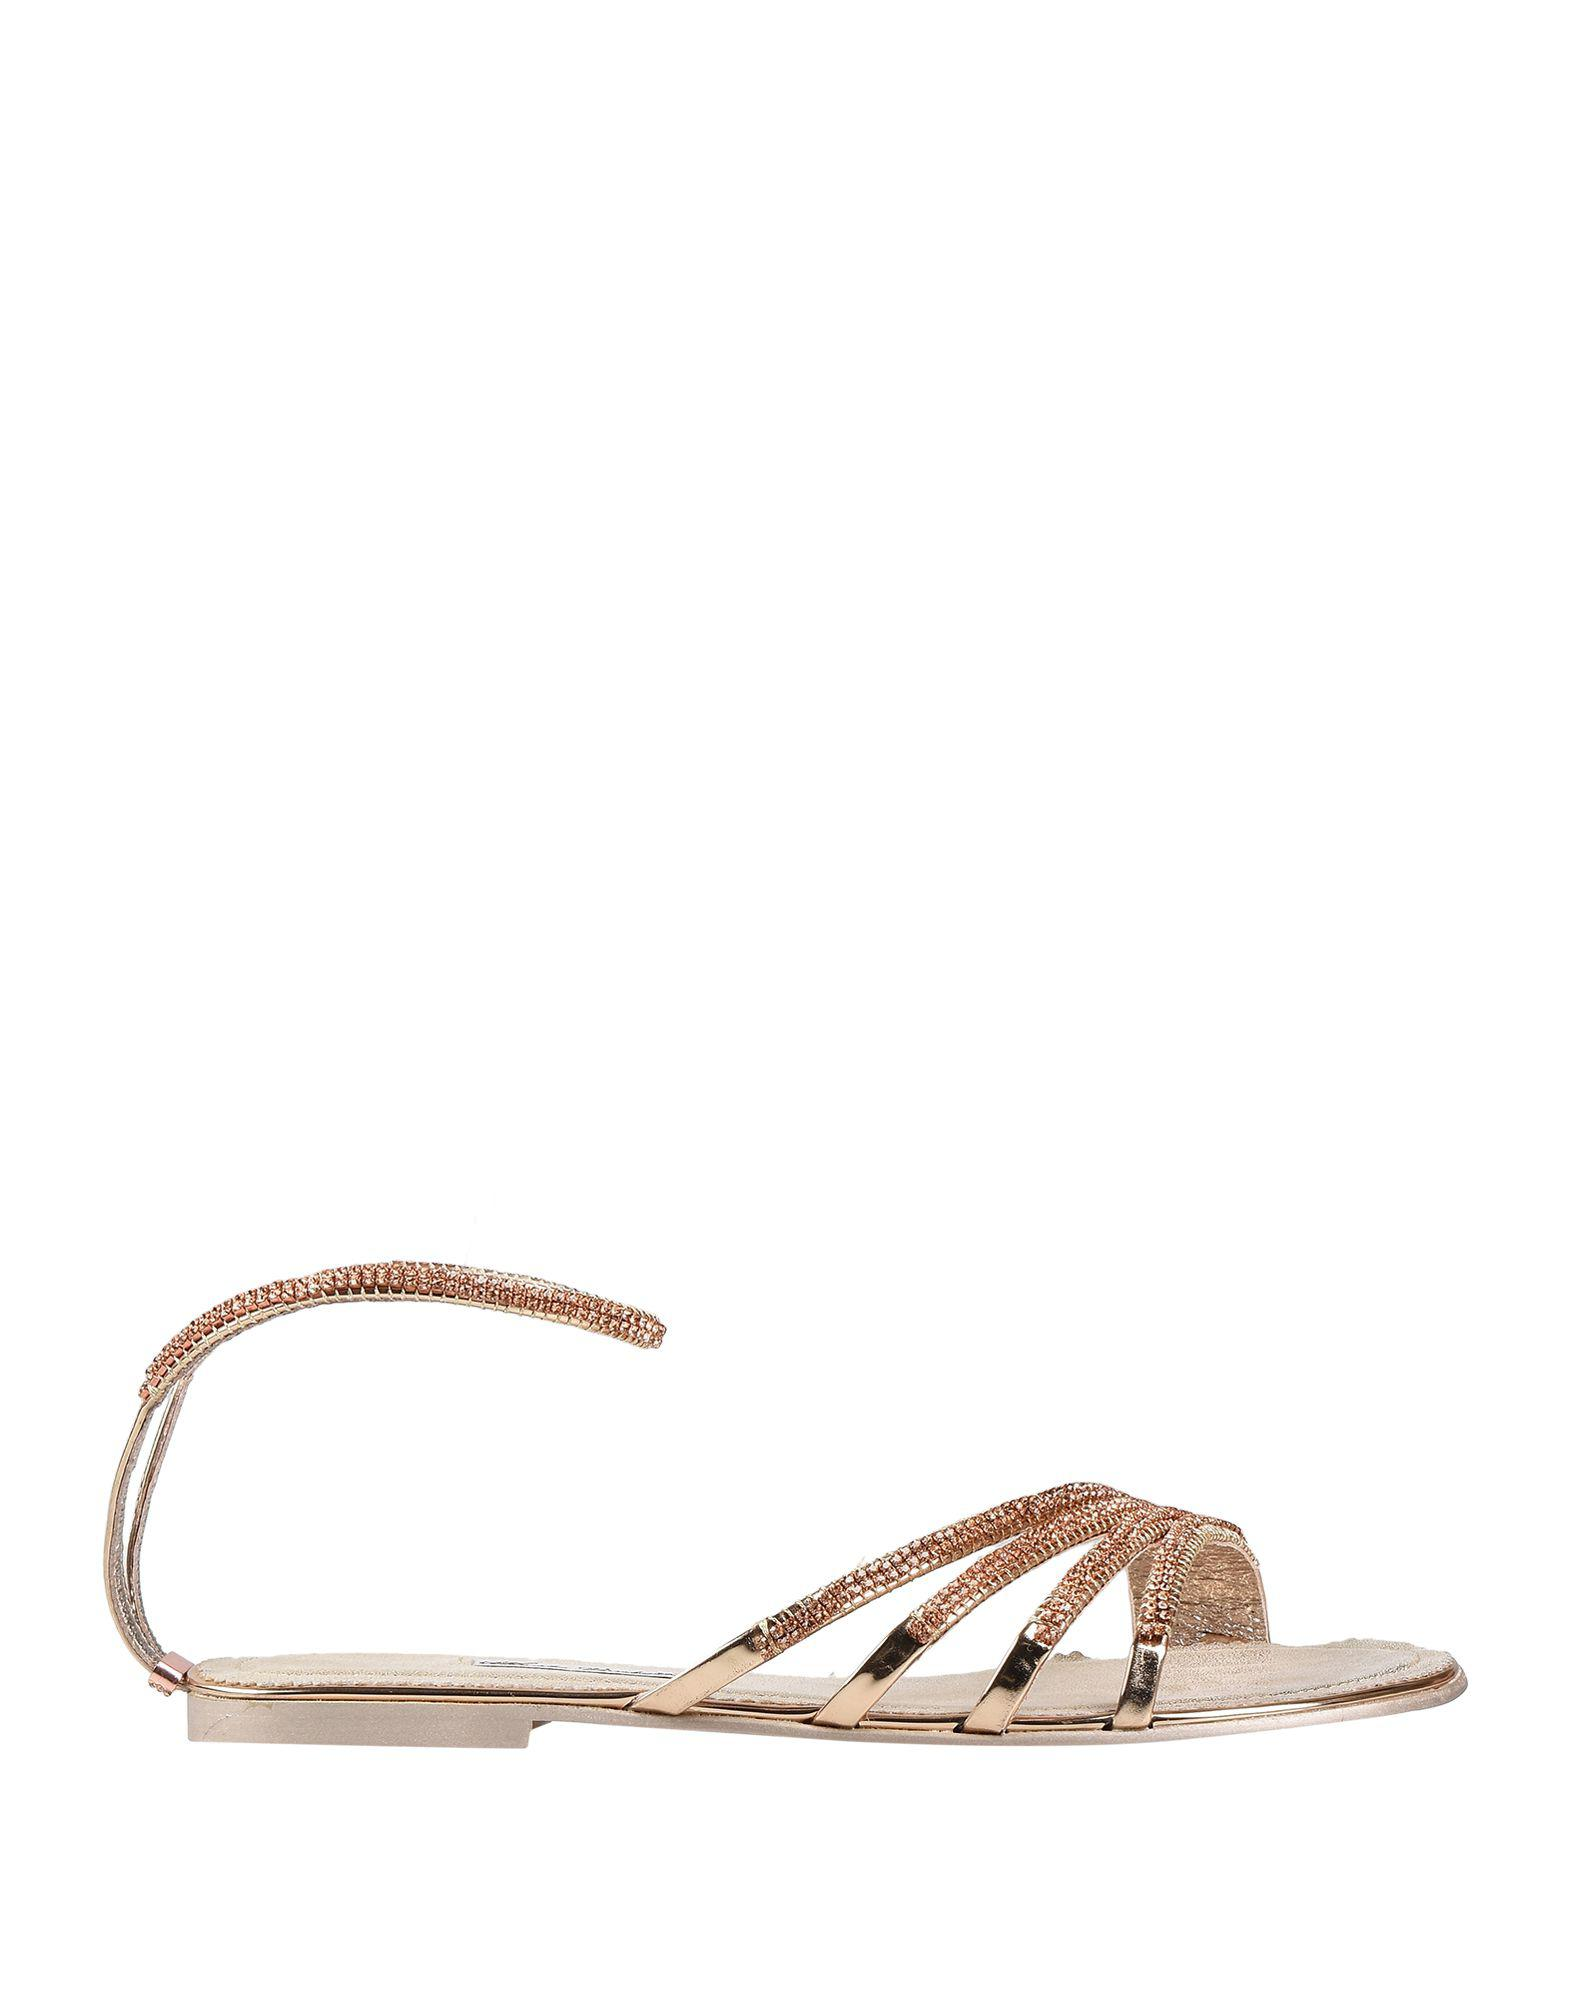 097889af82f alberto-venturini-Platinum-Sandals.jpeg